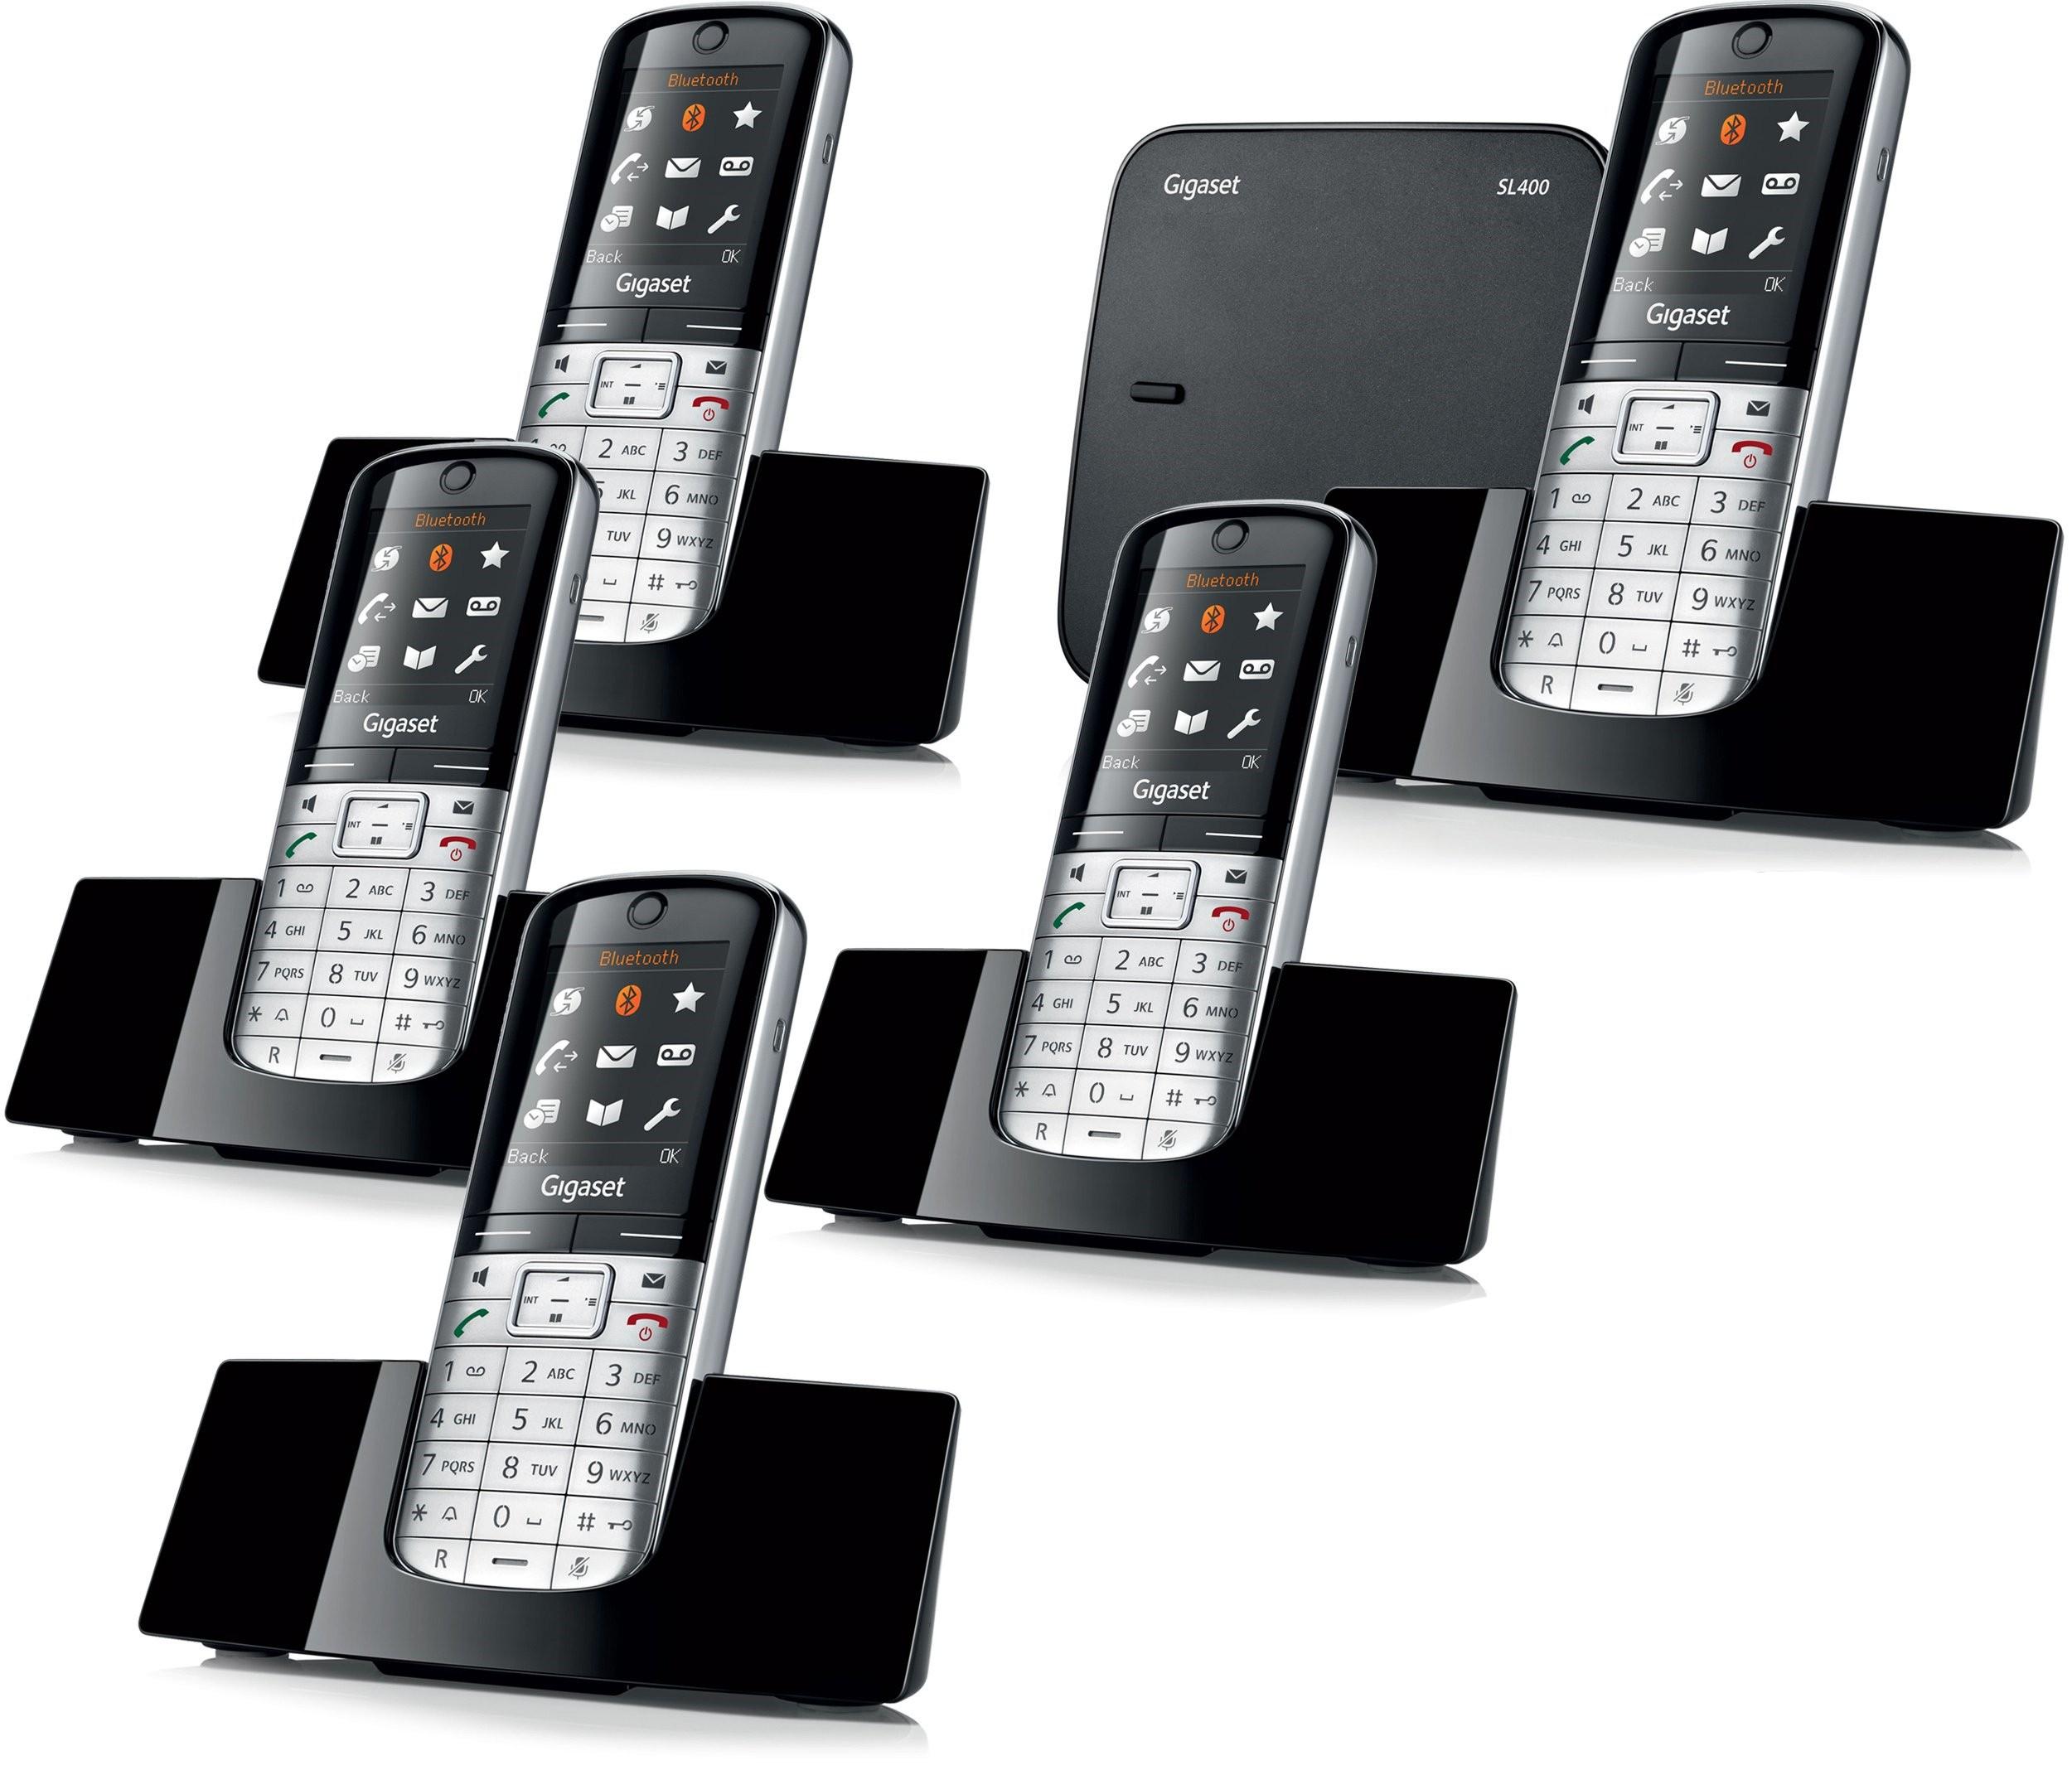 Siemens Gigaset SL400A Bluetooth Cordless Phone - Quint Pack